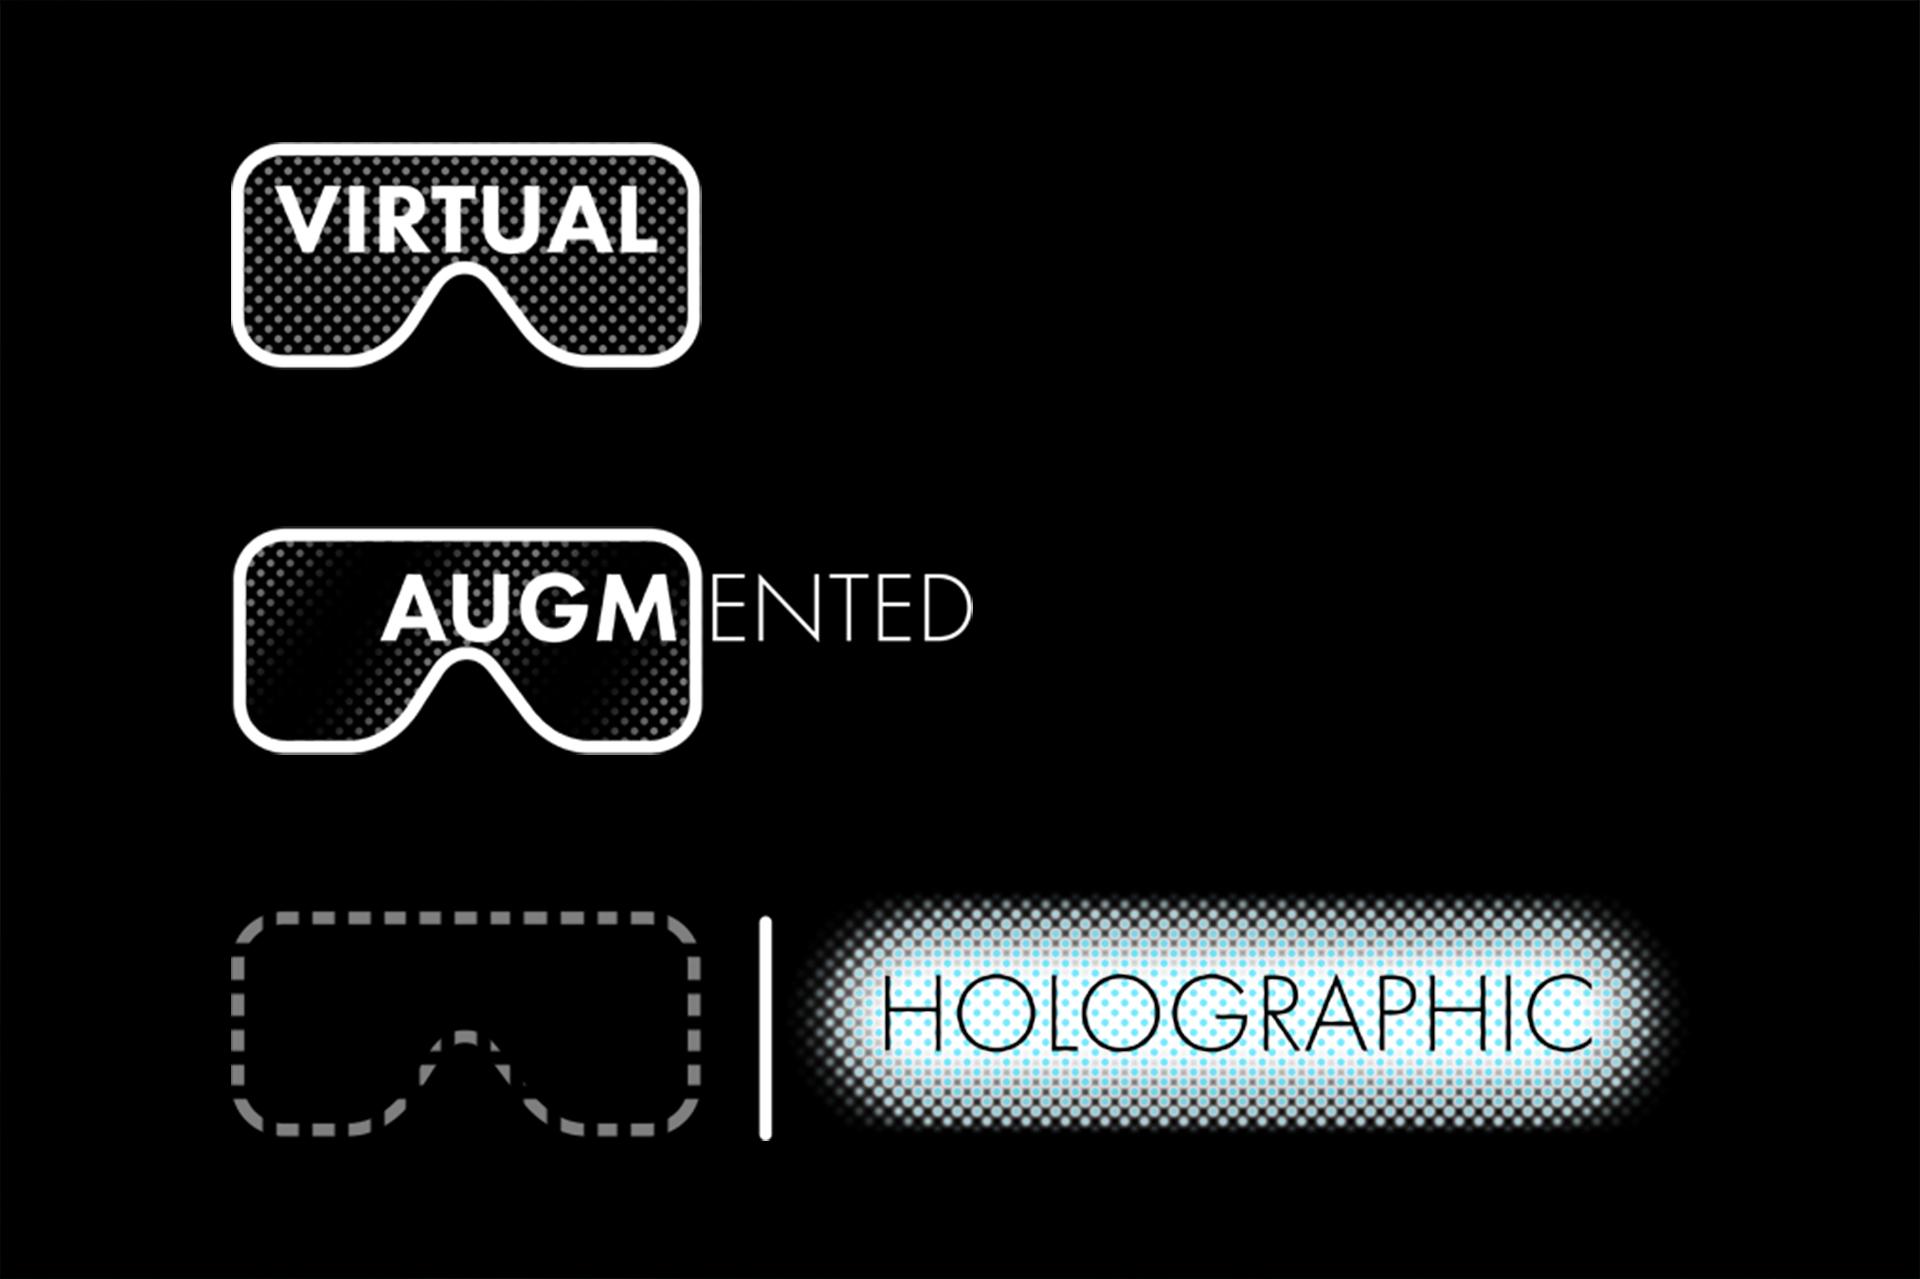 Behruz Hairullaev - Behruz-Hairullaev-HolographicReality-2 (1).jpg